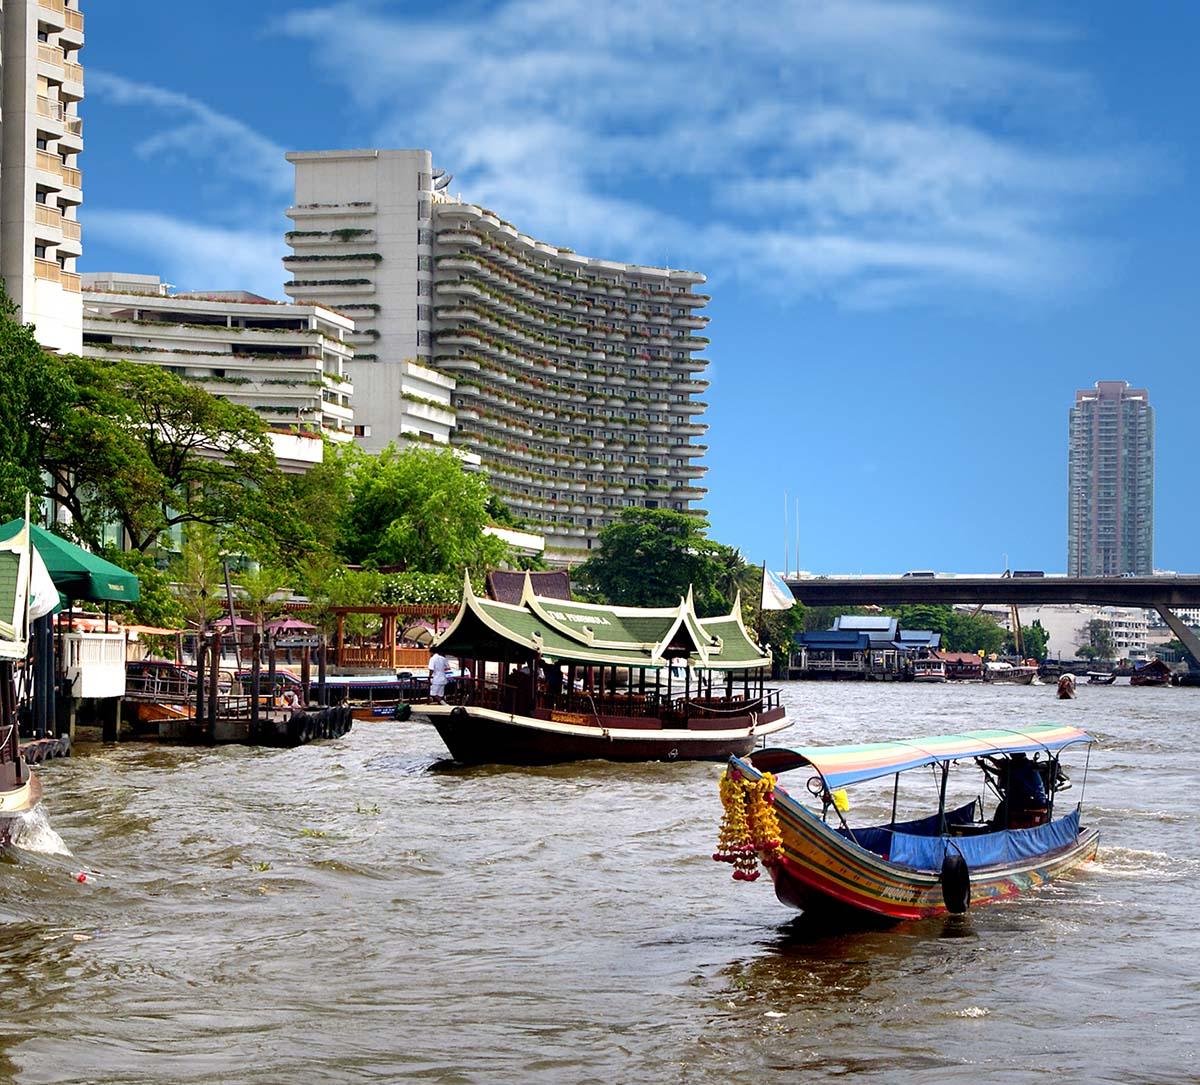 Bangkok events organicity project